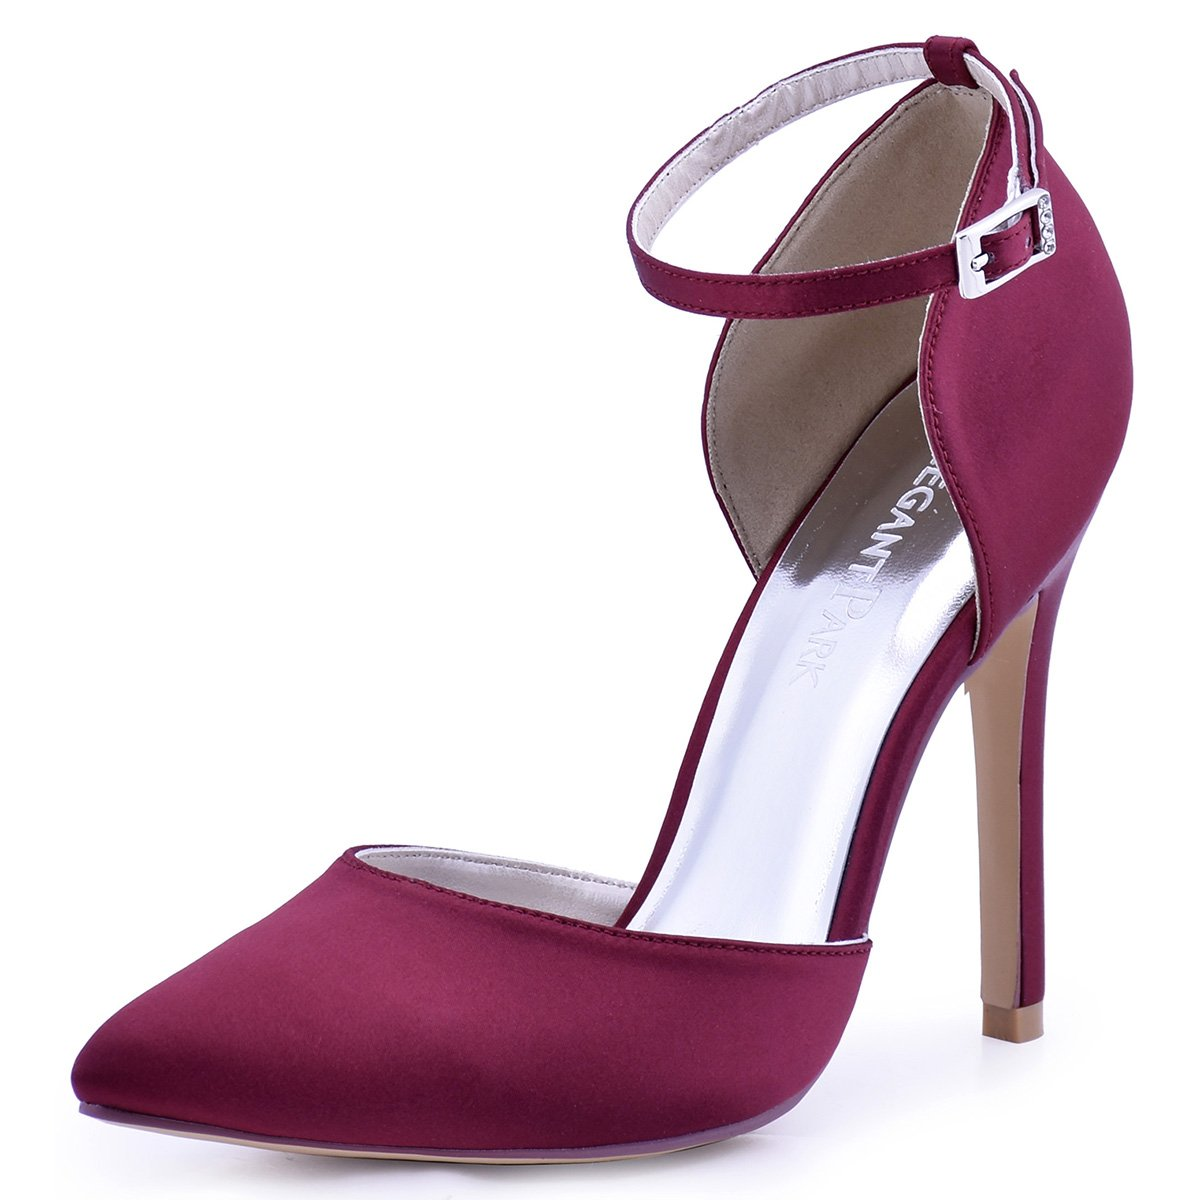 ElegantPark HC1602 Women's Pointed Toe High Heel Ankle Strap D'Orsay Satin Dress Pumps Burgundy US 7.5